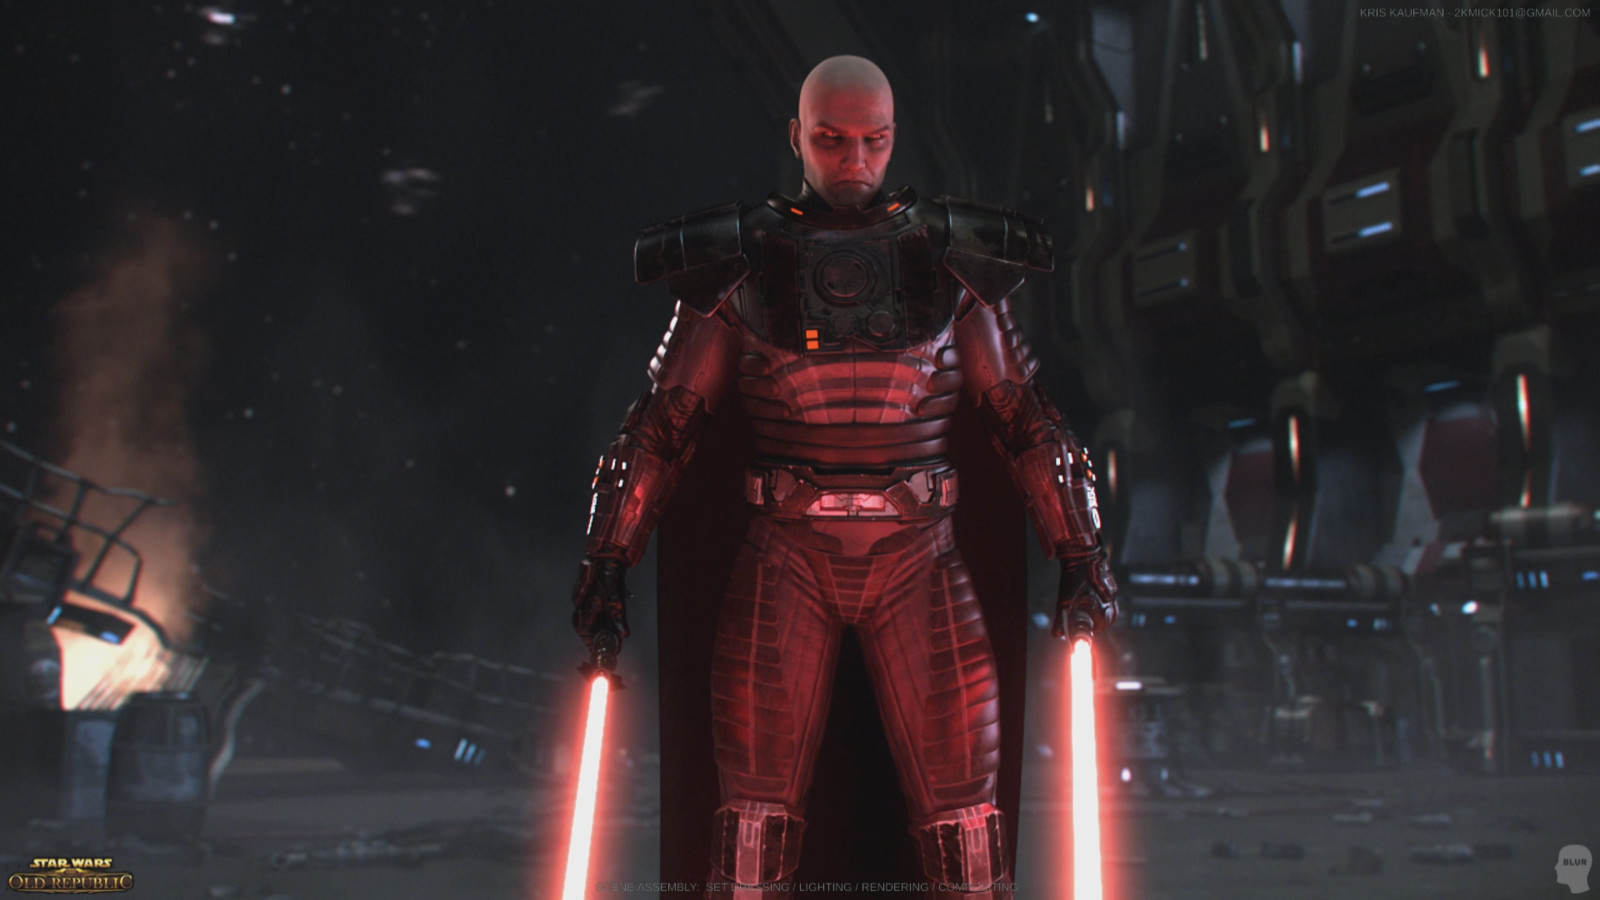 Star Wars: The Old Republic: Set Dressing / Lighting / Rendering / Compositing